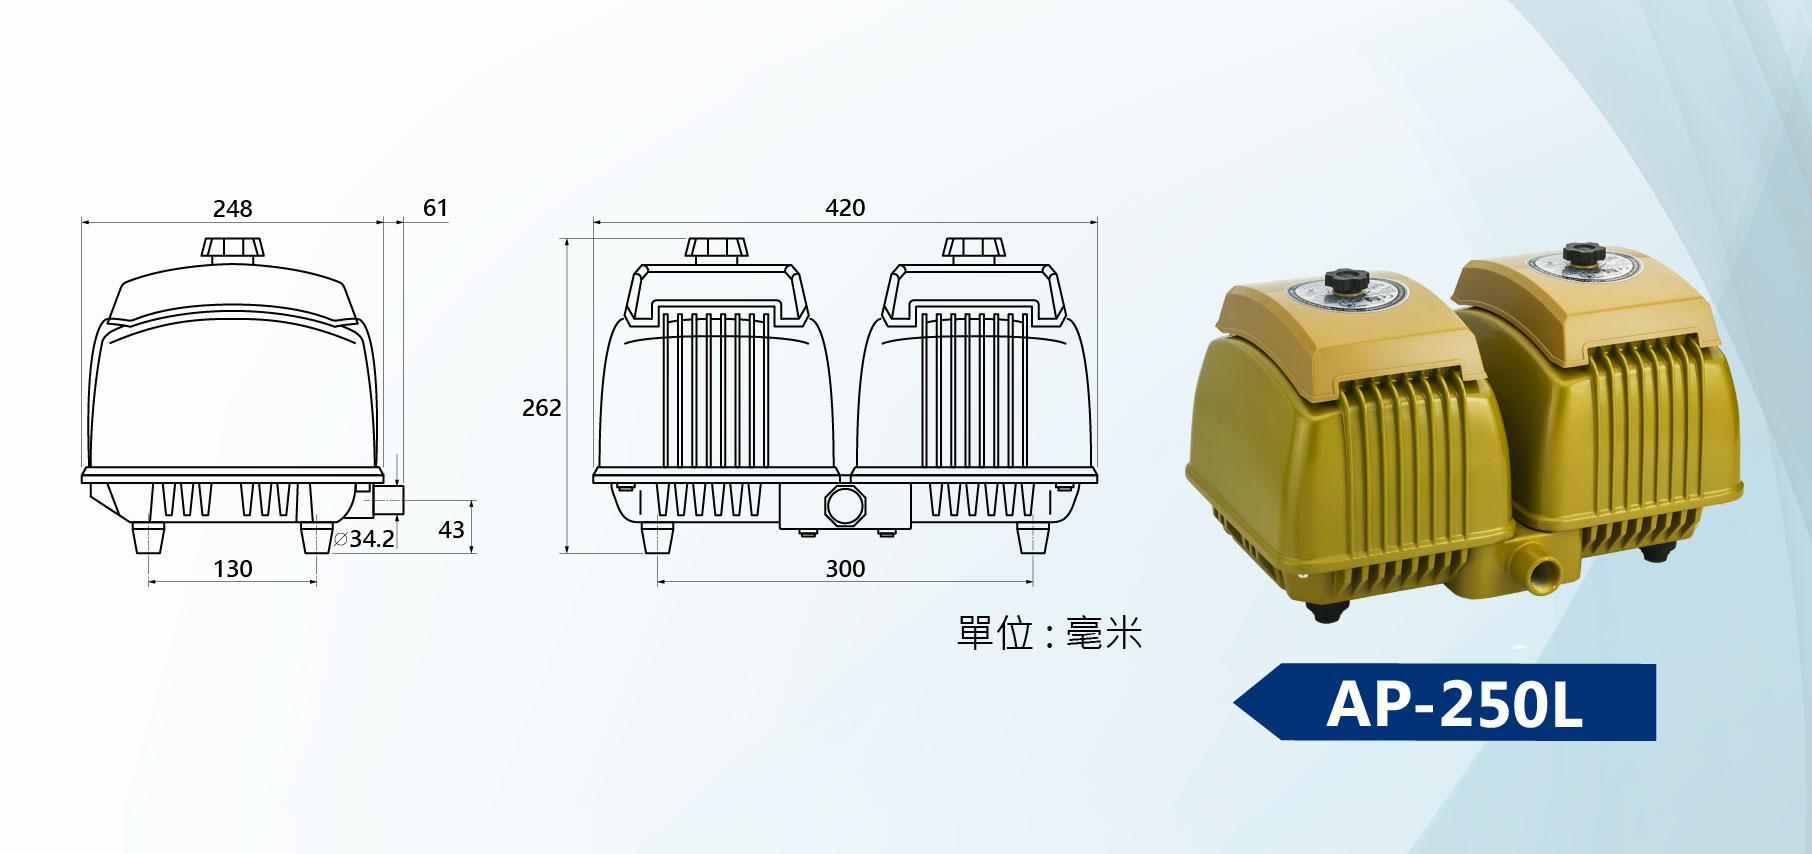 AP-250Lリニアエアーポンプ寸法